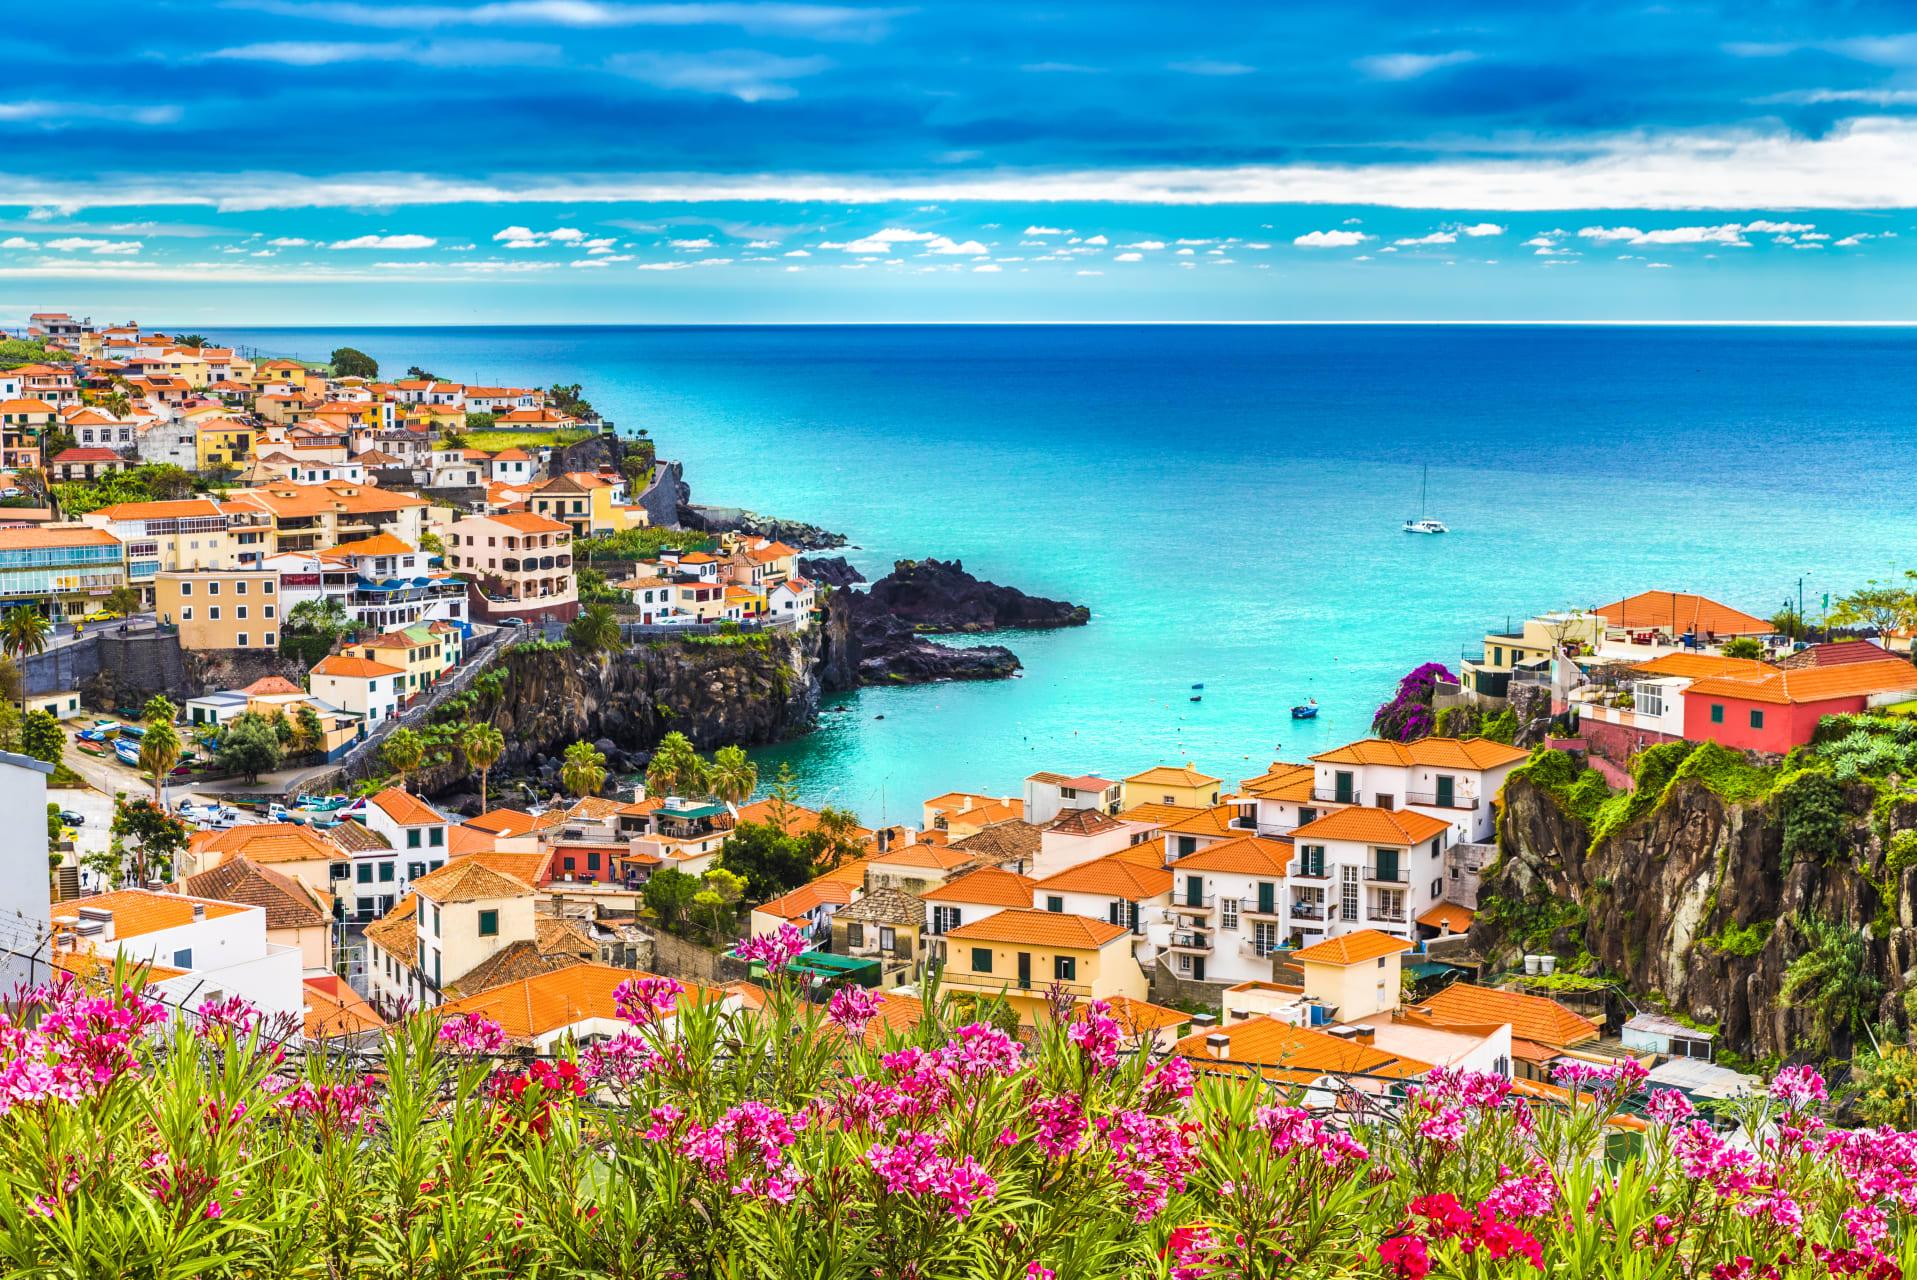 Madeira - Visit the beautiful fishing village of Camara de Lobos near Funchal, Madeira